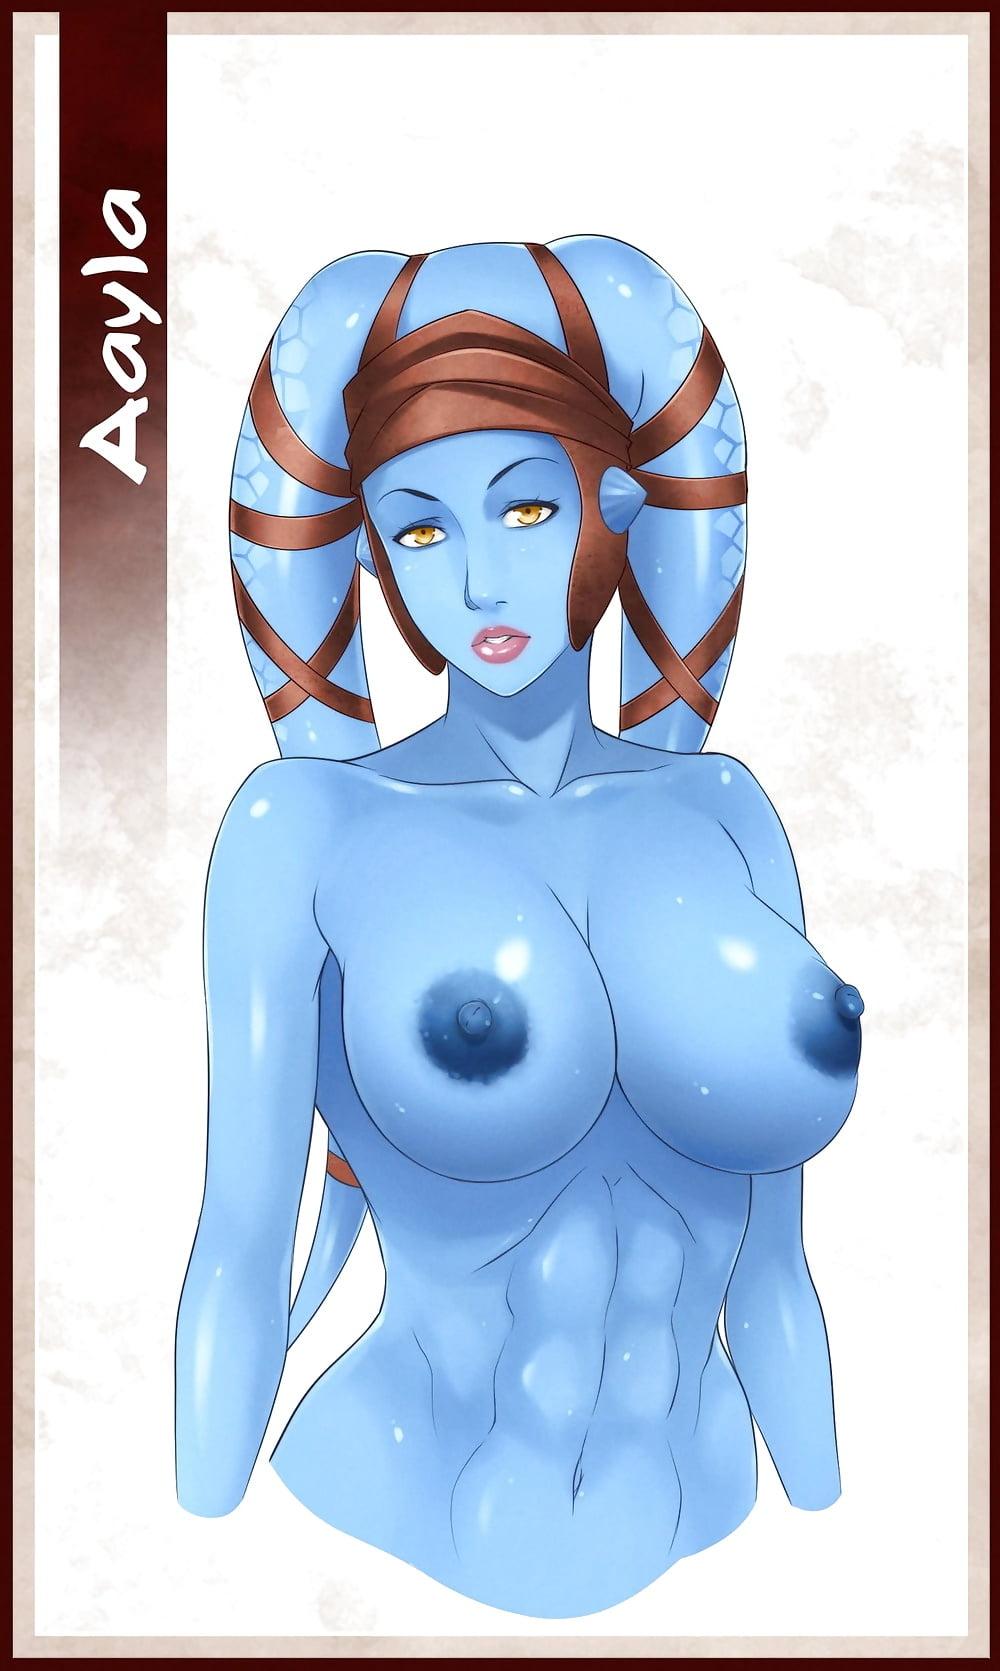 Nude star wars hentai aayla secura porn